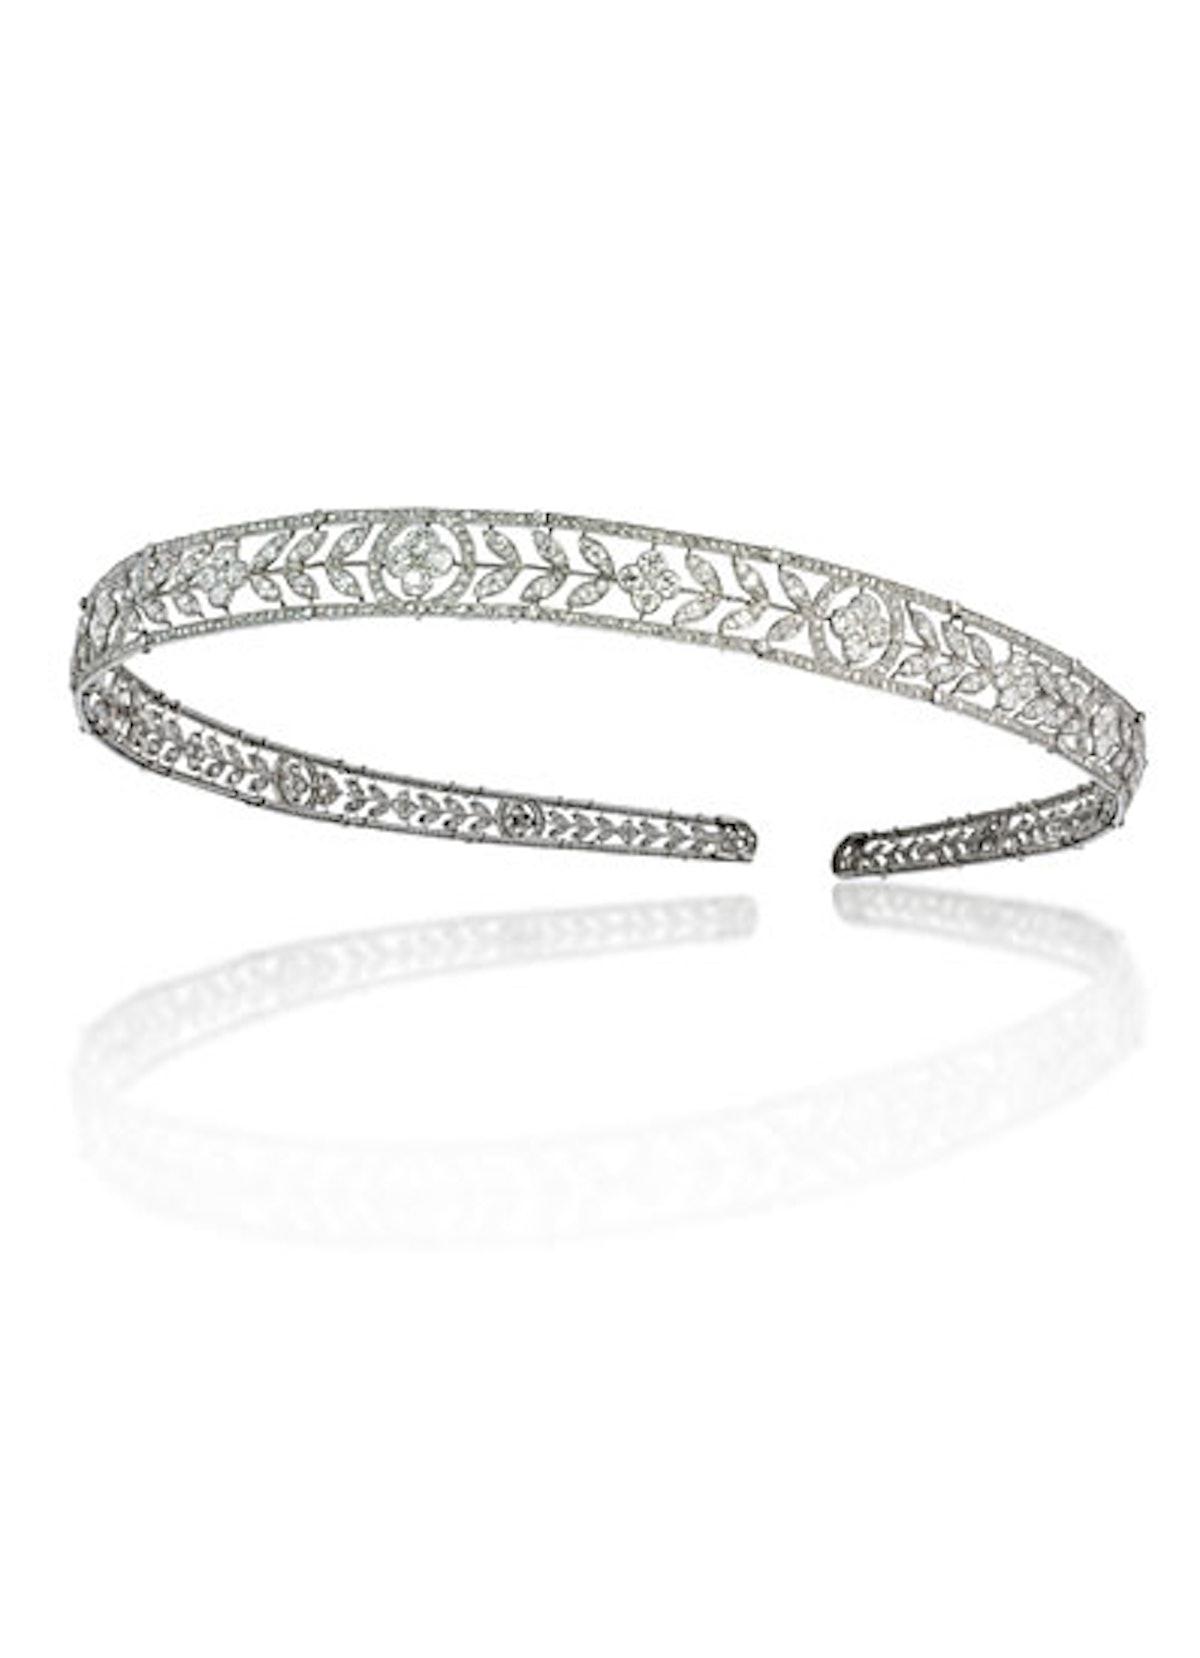 acss-royal-wedding-jewelry-04-v.jpg